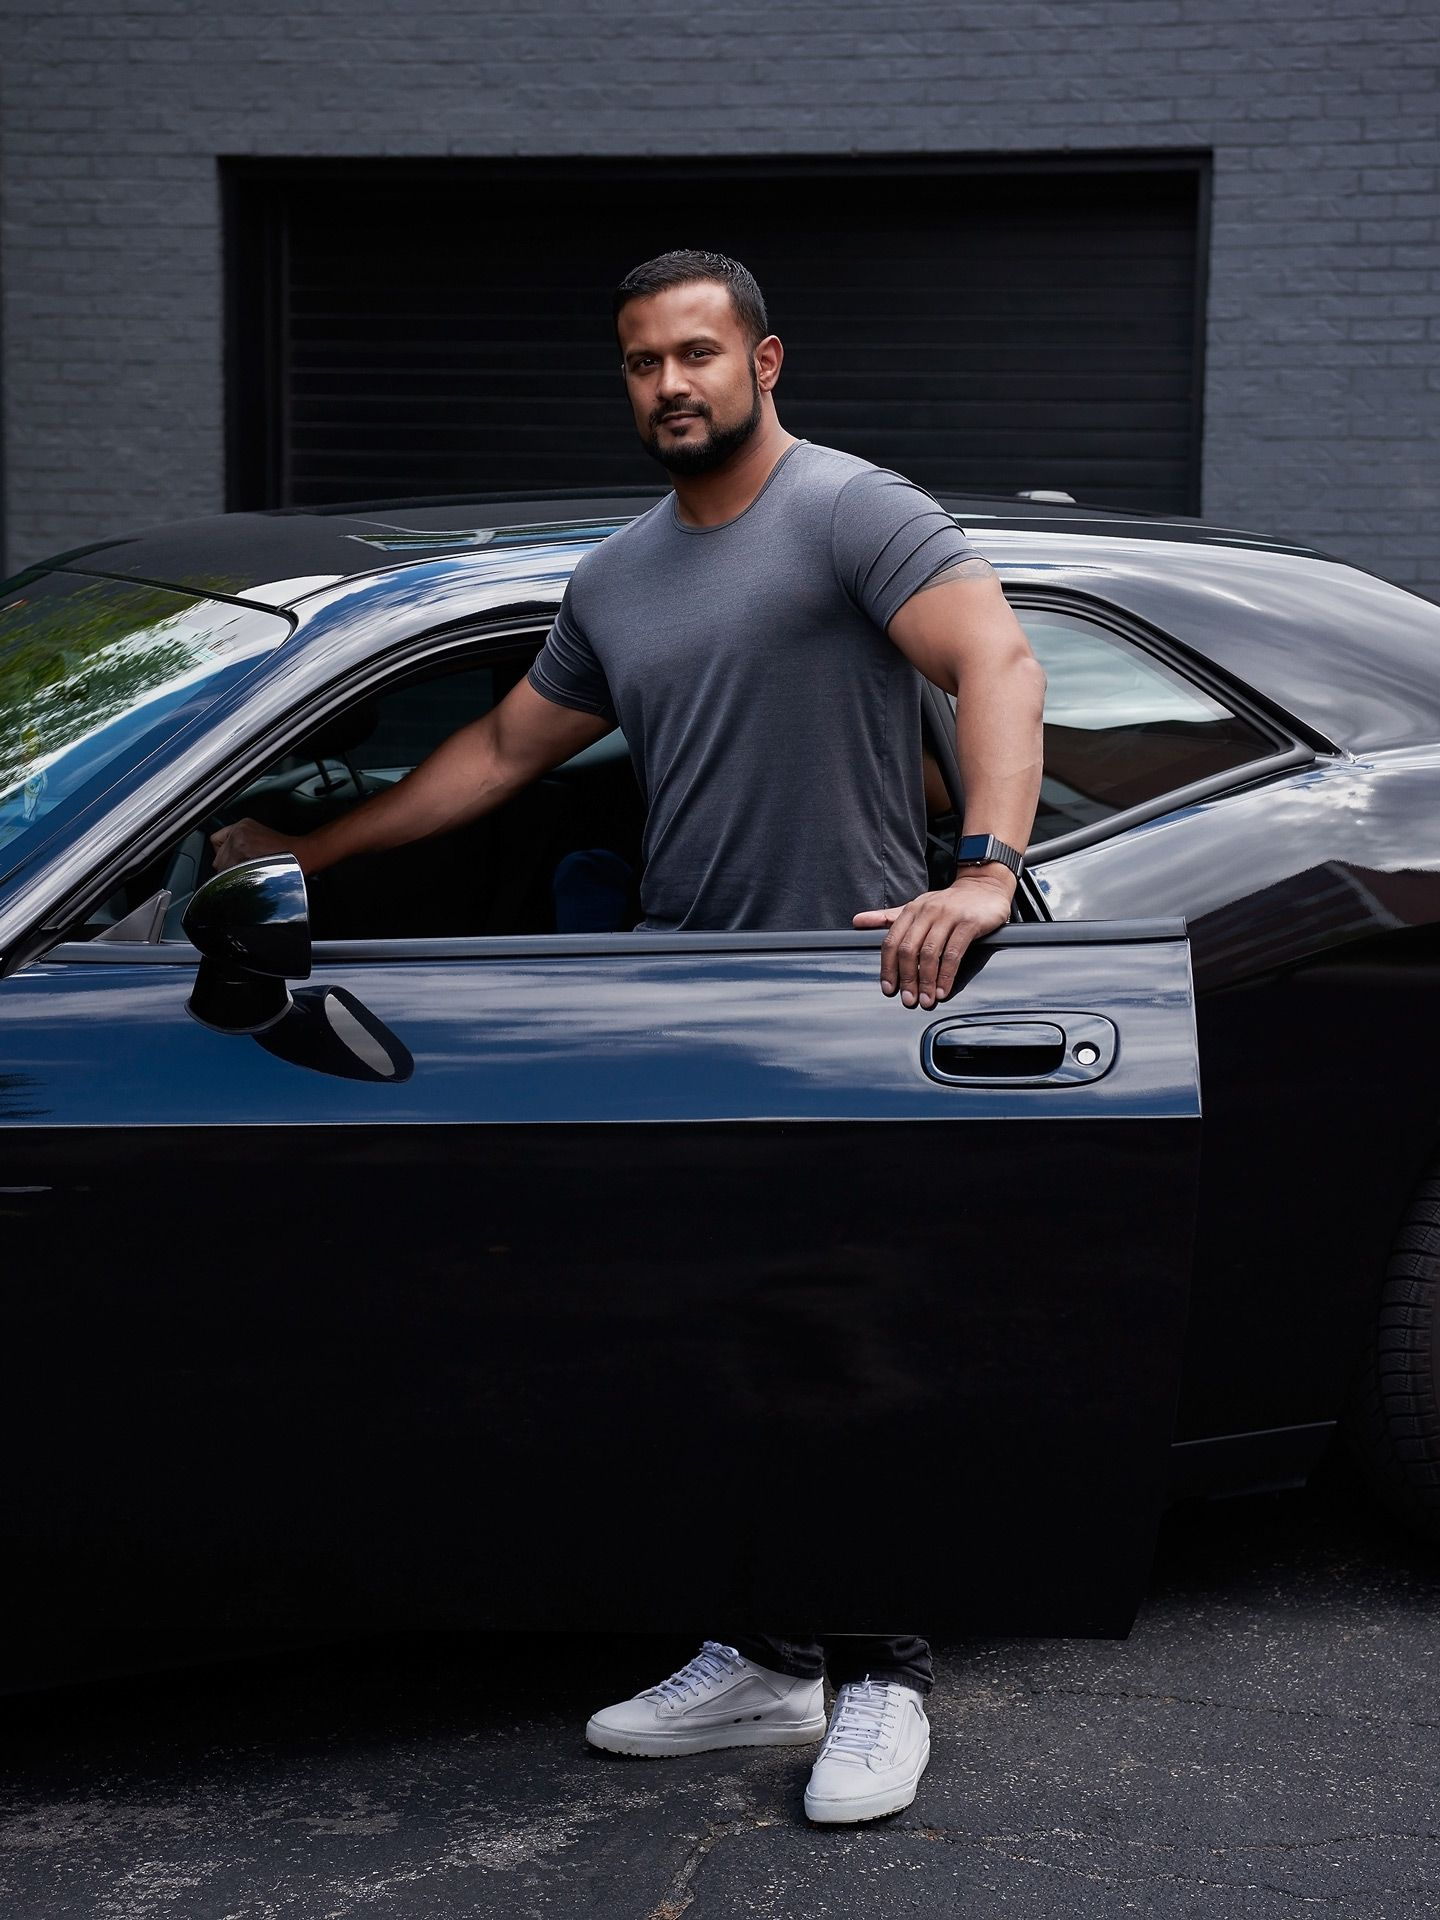 portrait of Dax Dasilva black man next to his car by Guillaume Simoneau